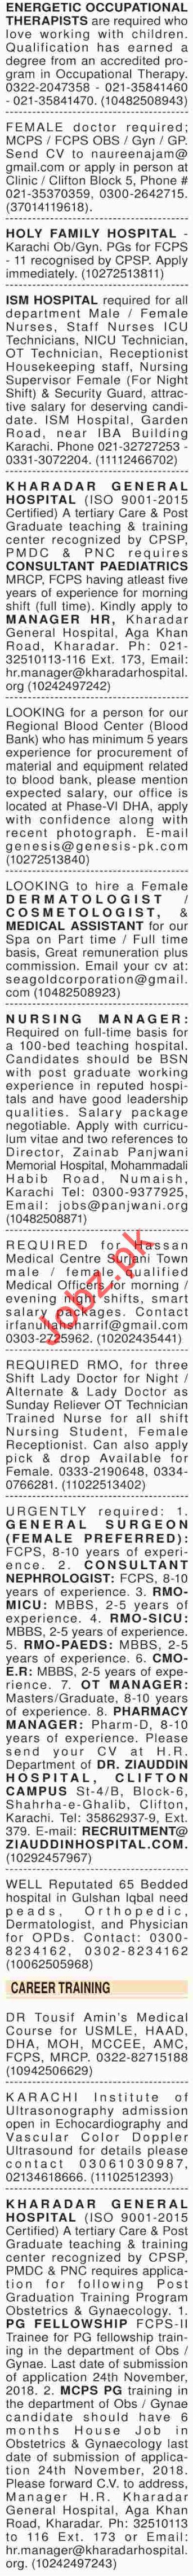 Dawn Sunday Newspaper Classified Medical Ads 2018